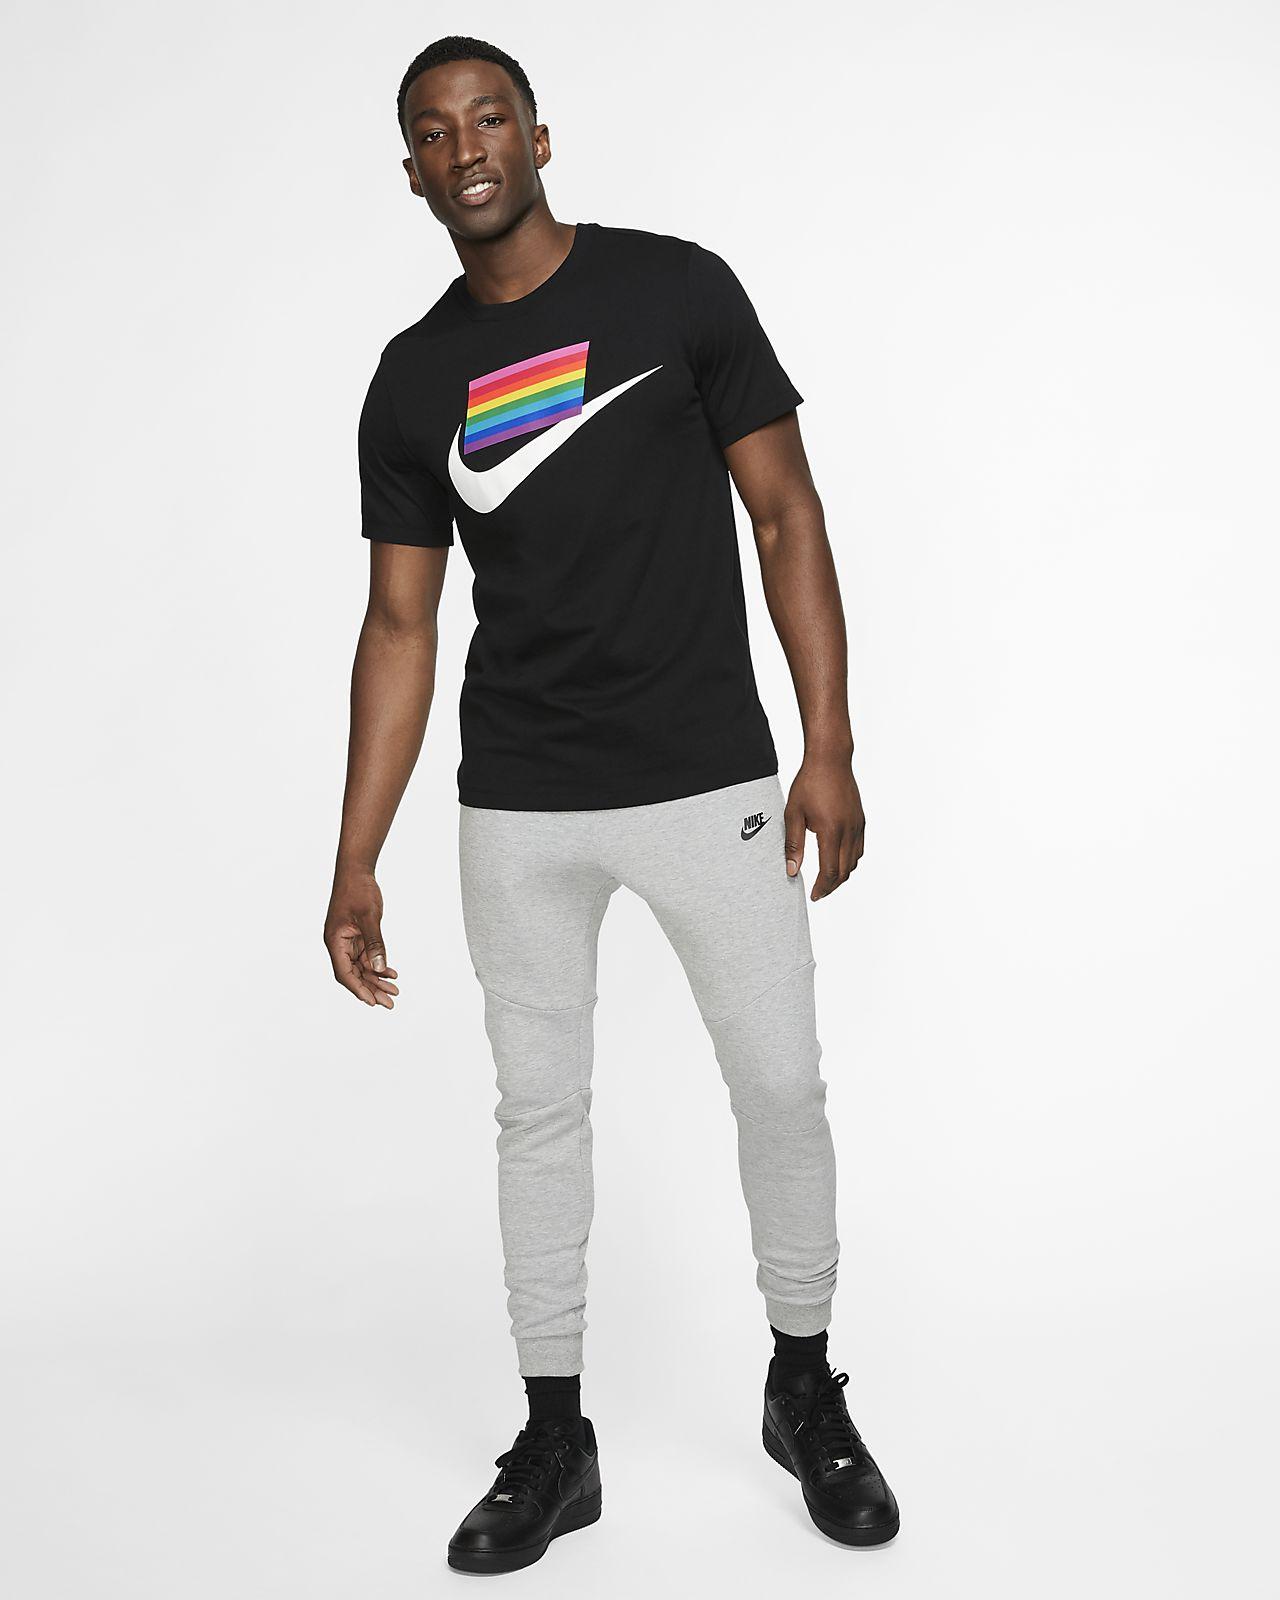 0b968062 Nike Sportswear BETRUE T-Shirt. Nike.com